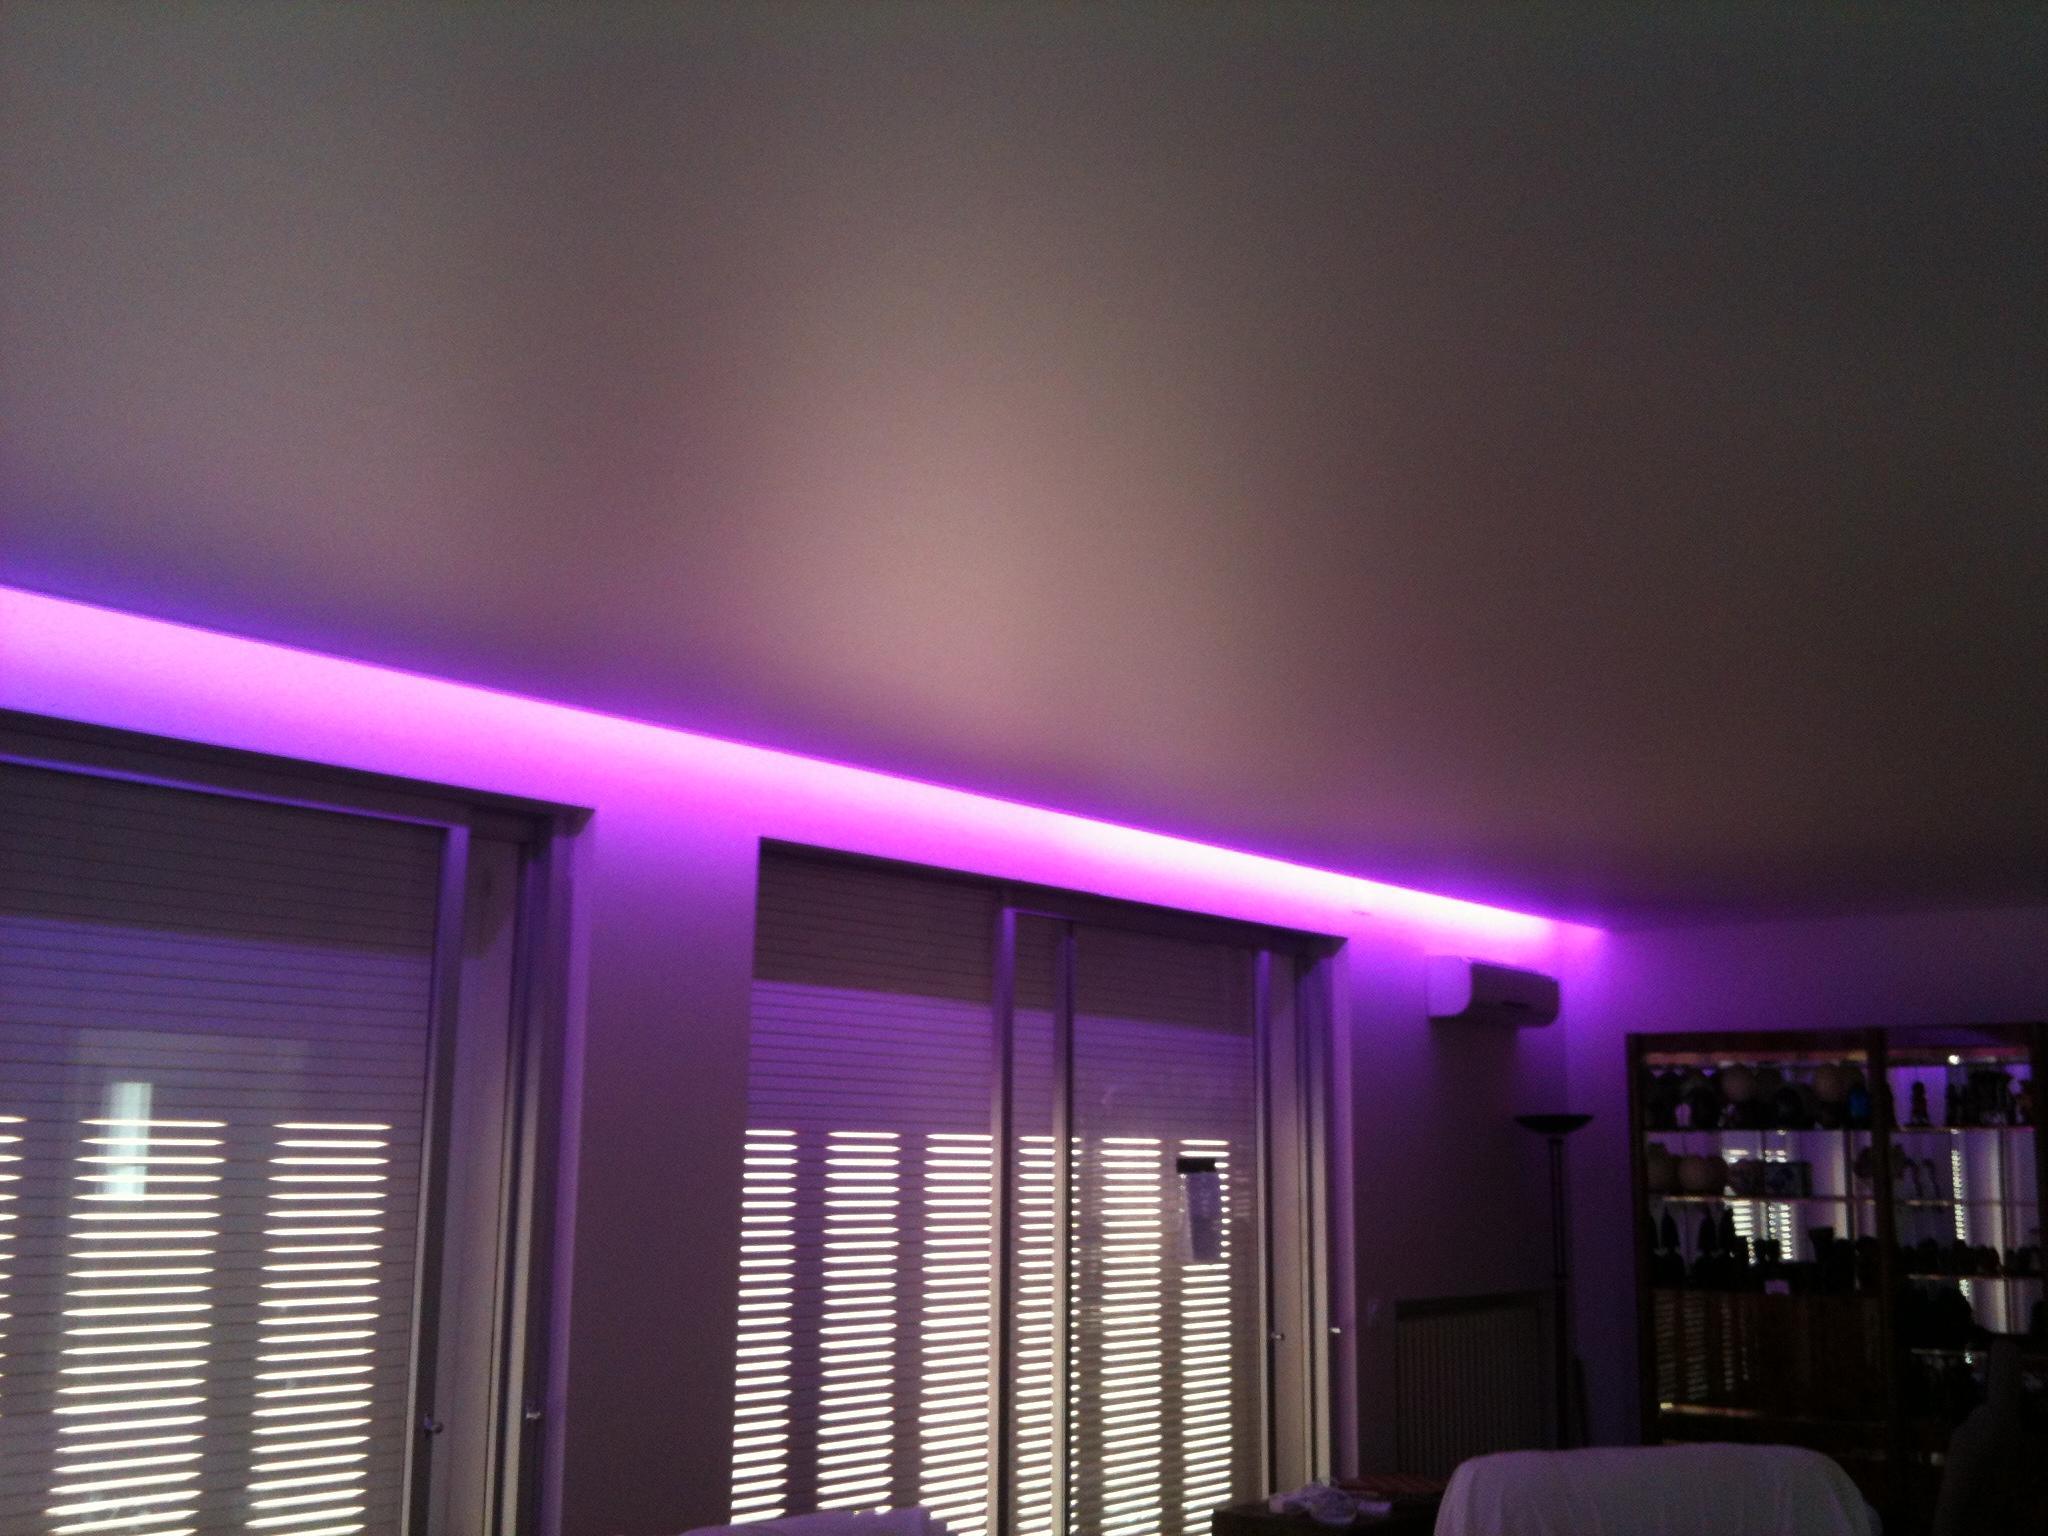 caisson lumineux plafond. Black Bedroom Furniture Sets. Home Design Ideas